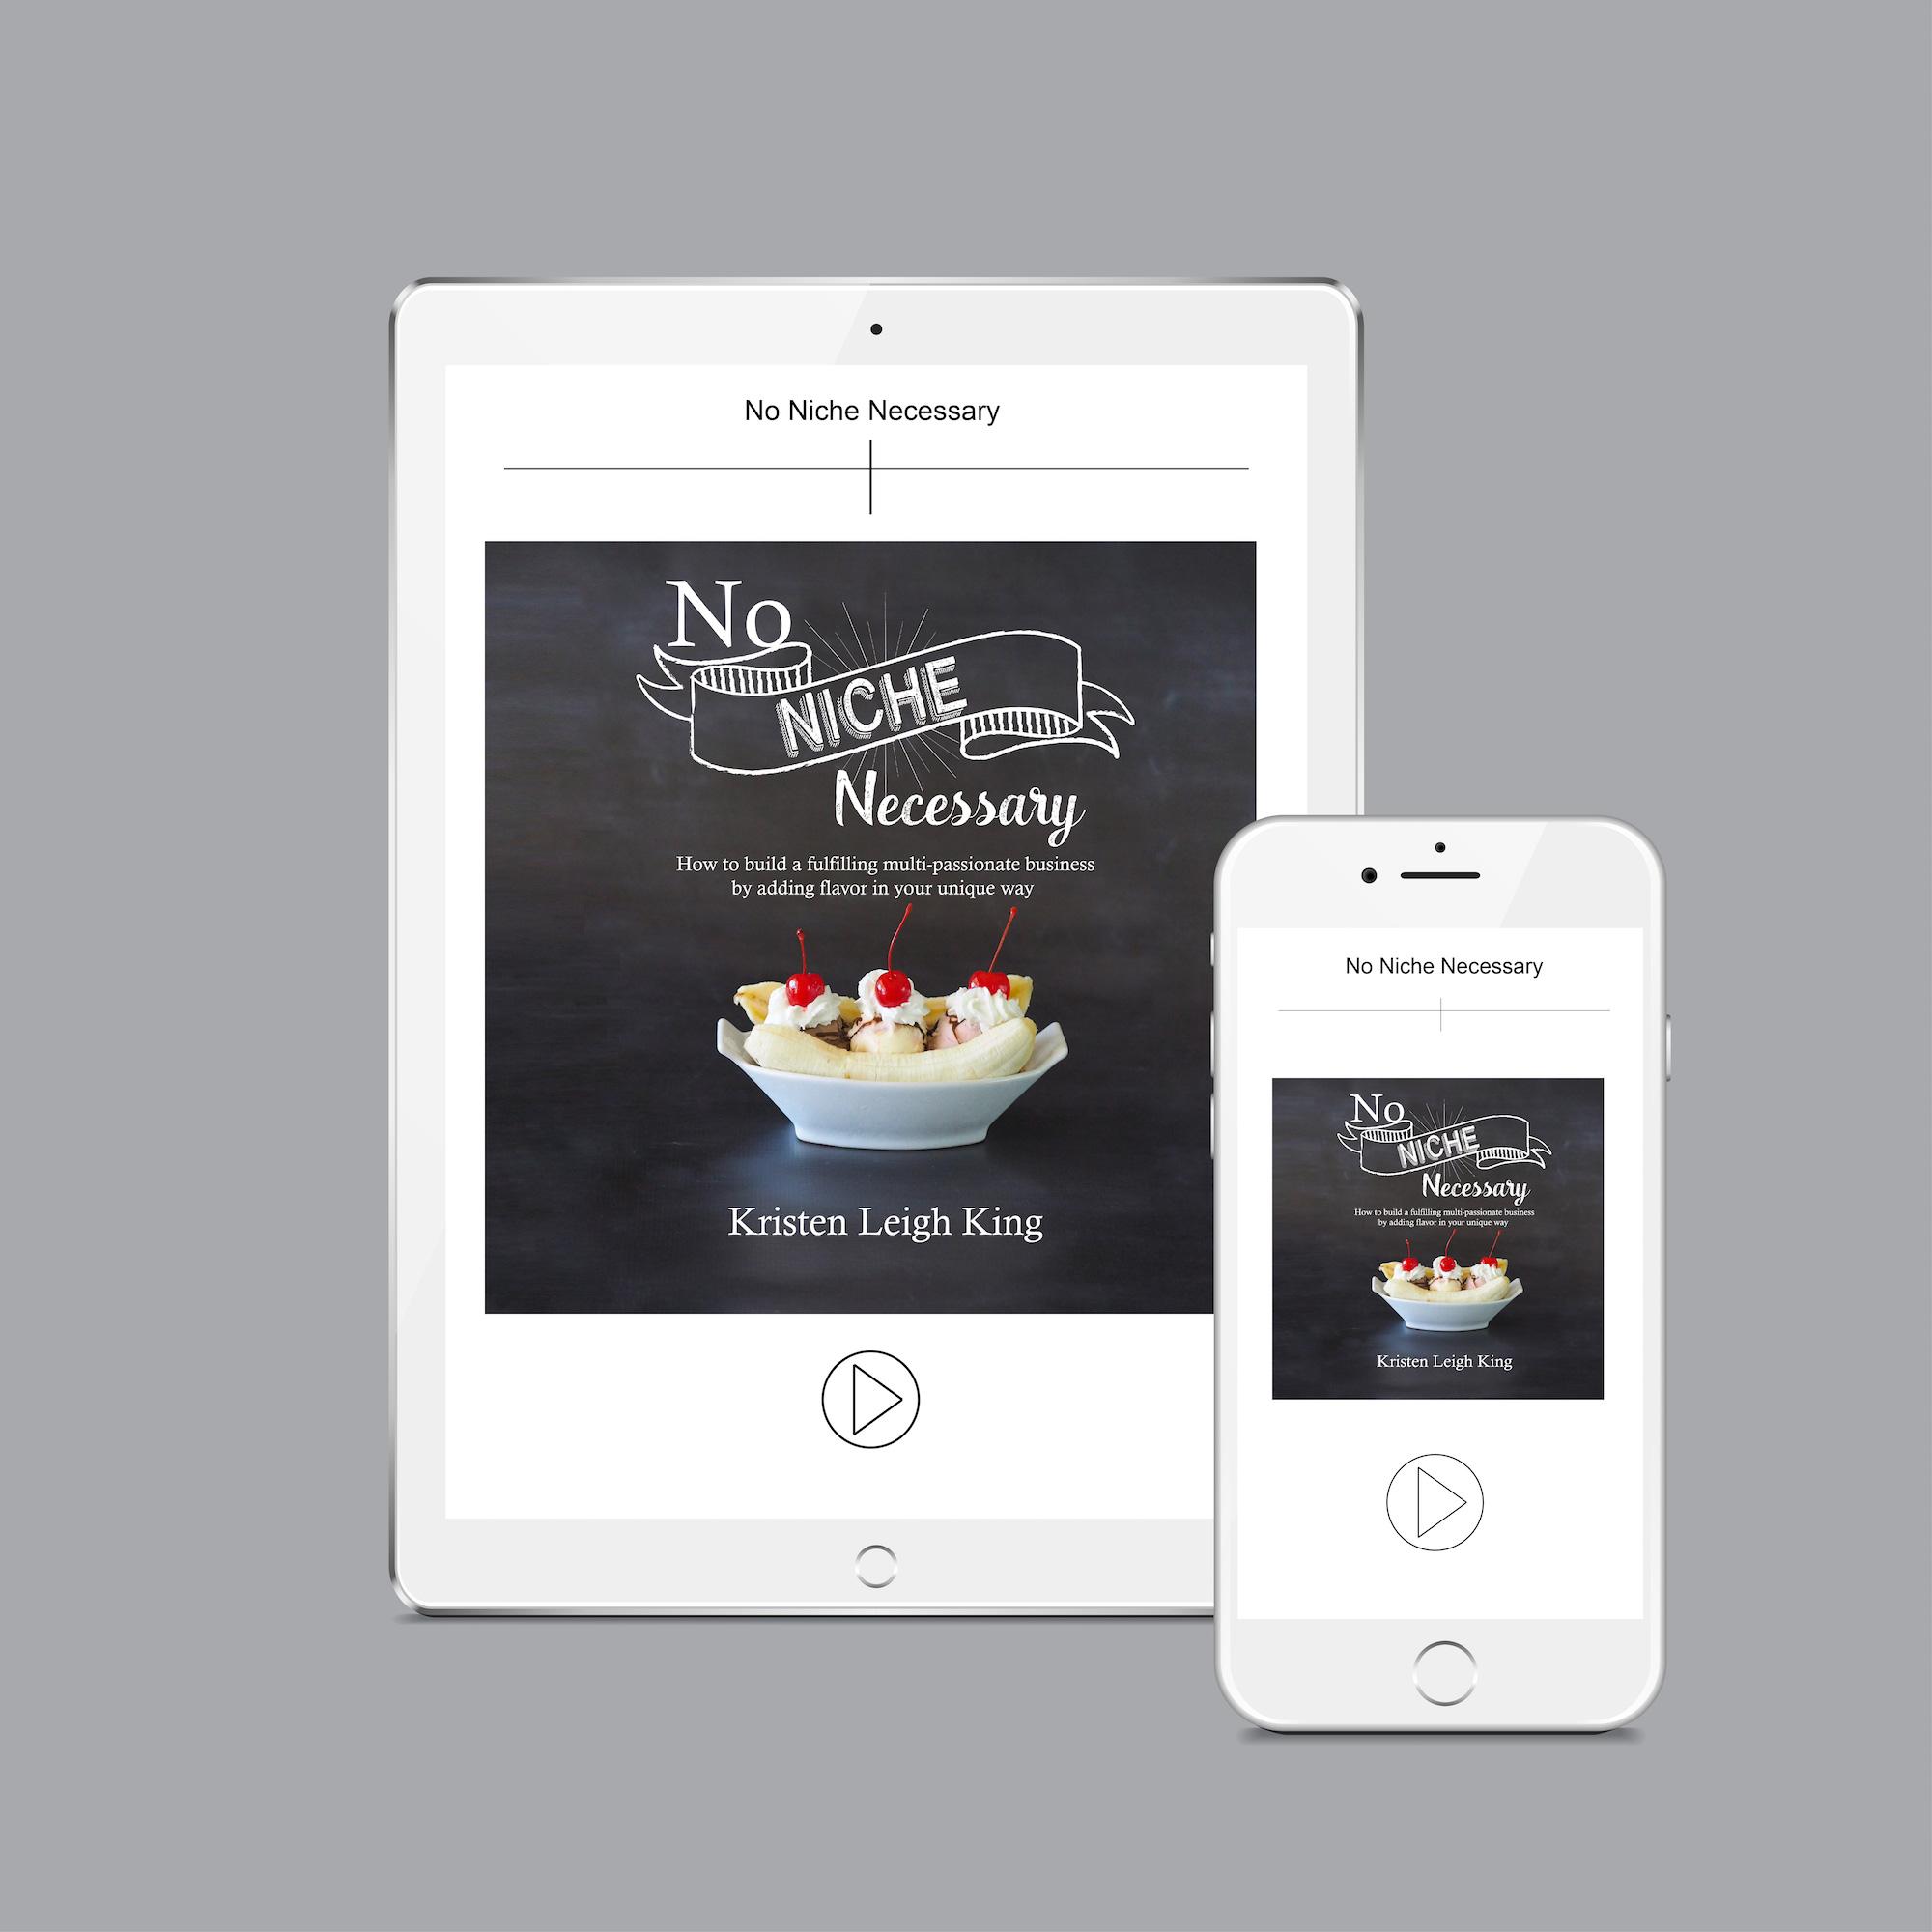 No Niche Necessary audiobook by Kristen Leigh King